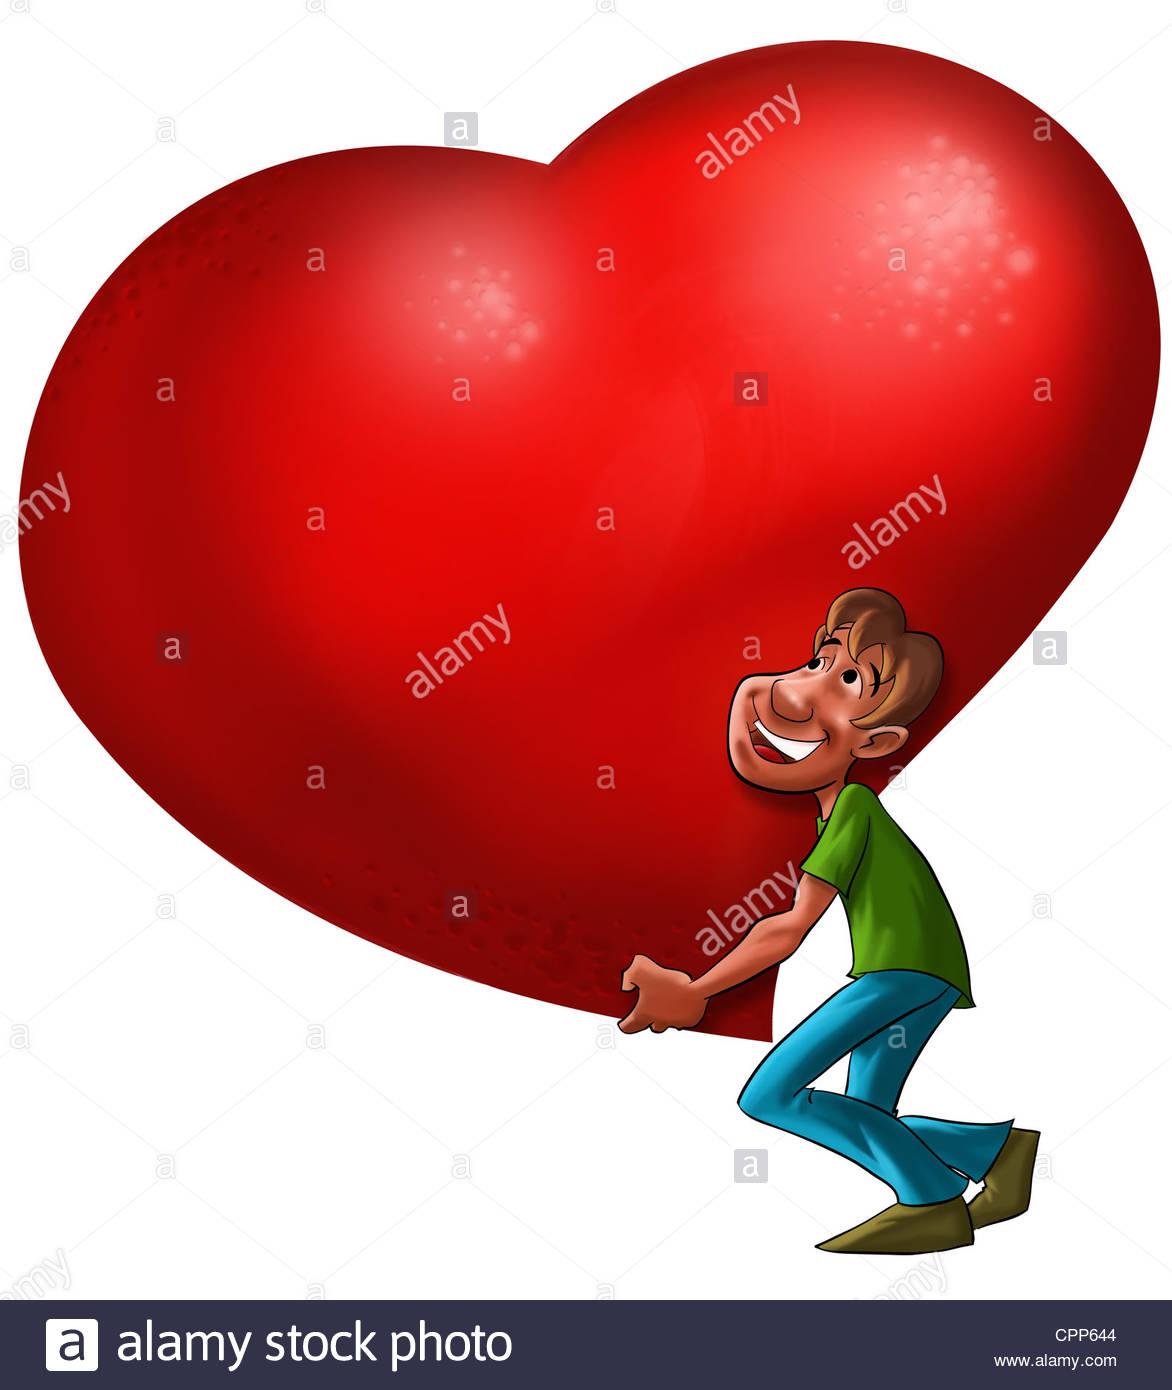 1172x1390 A Man Carrying A Big Heart Stock Photo 48430932